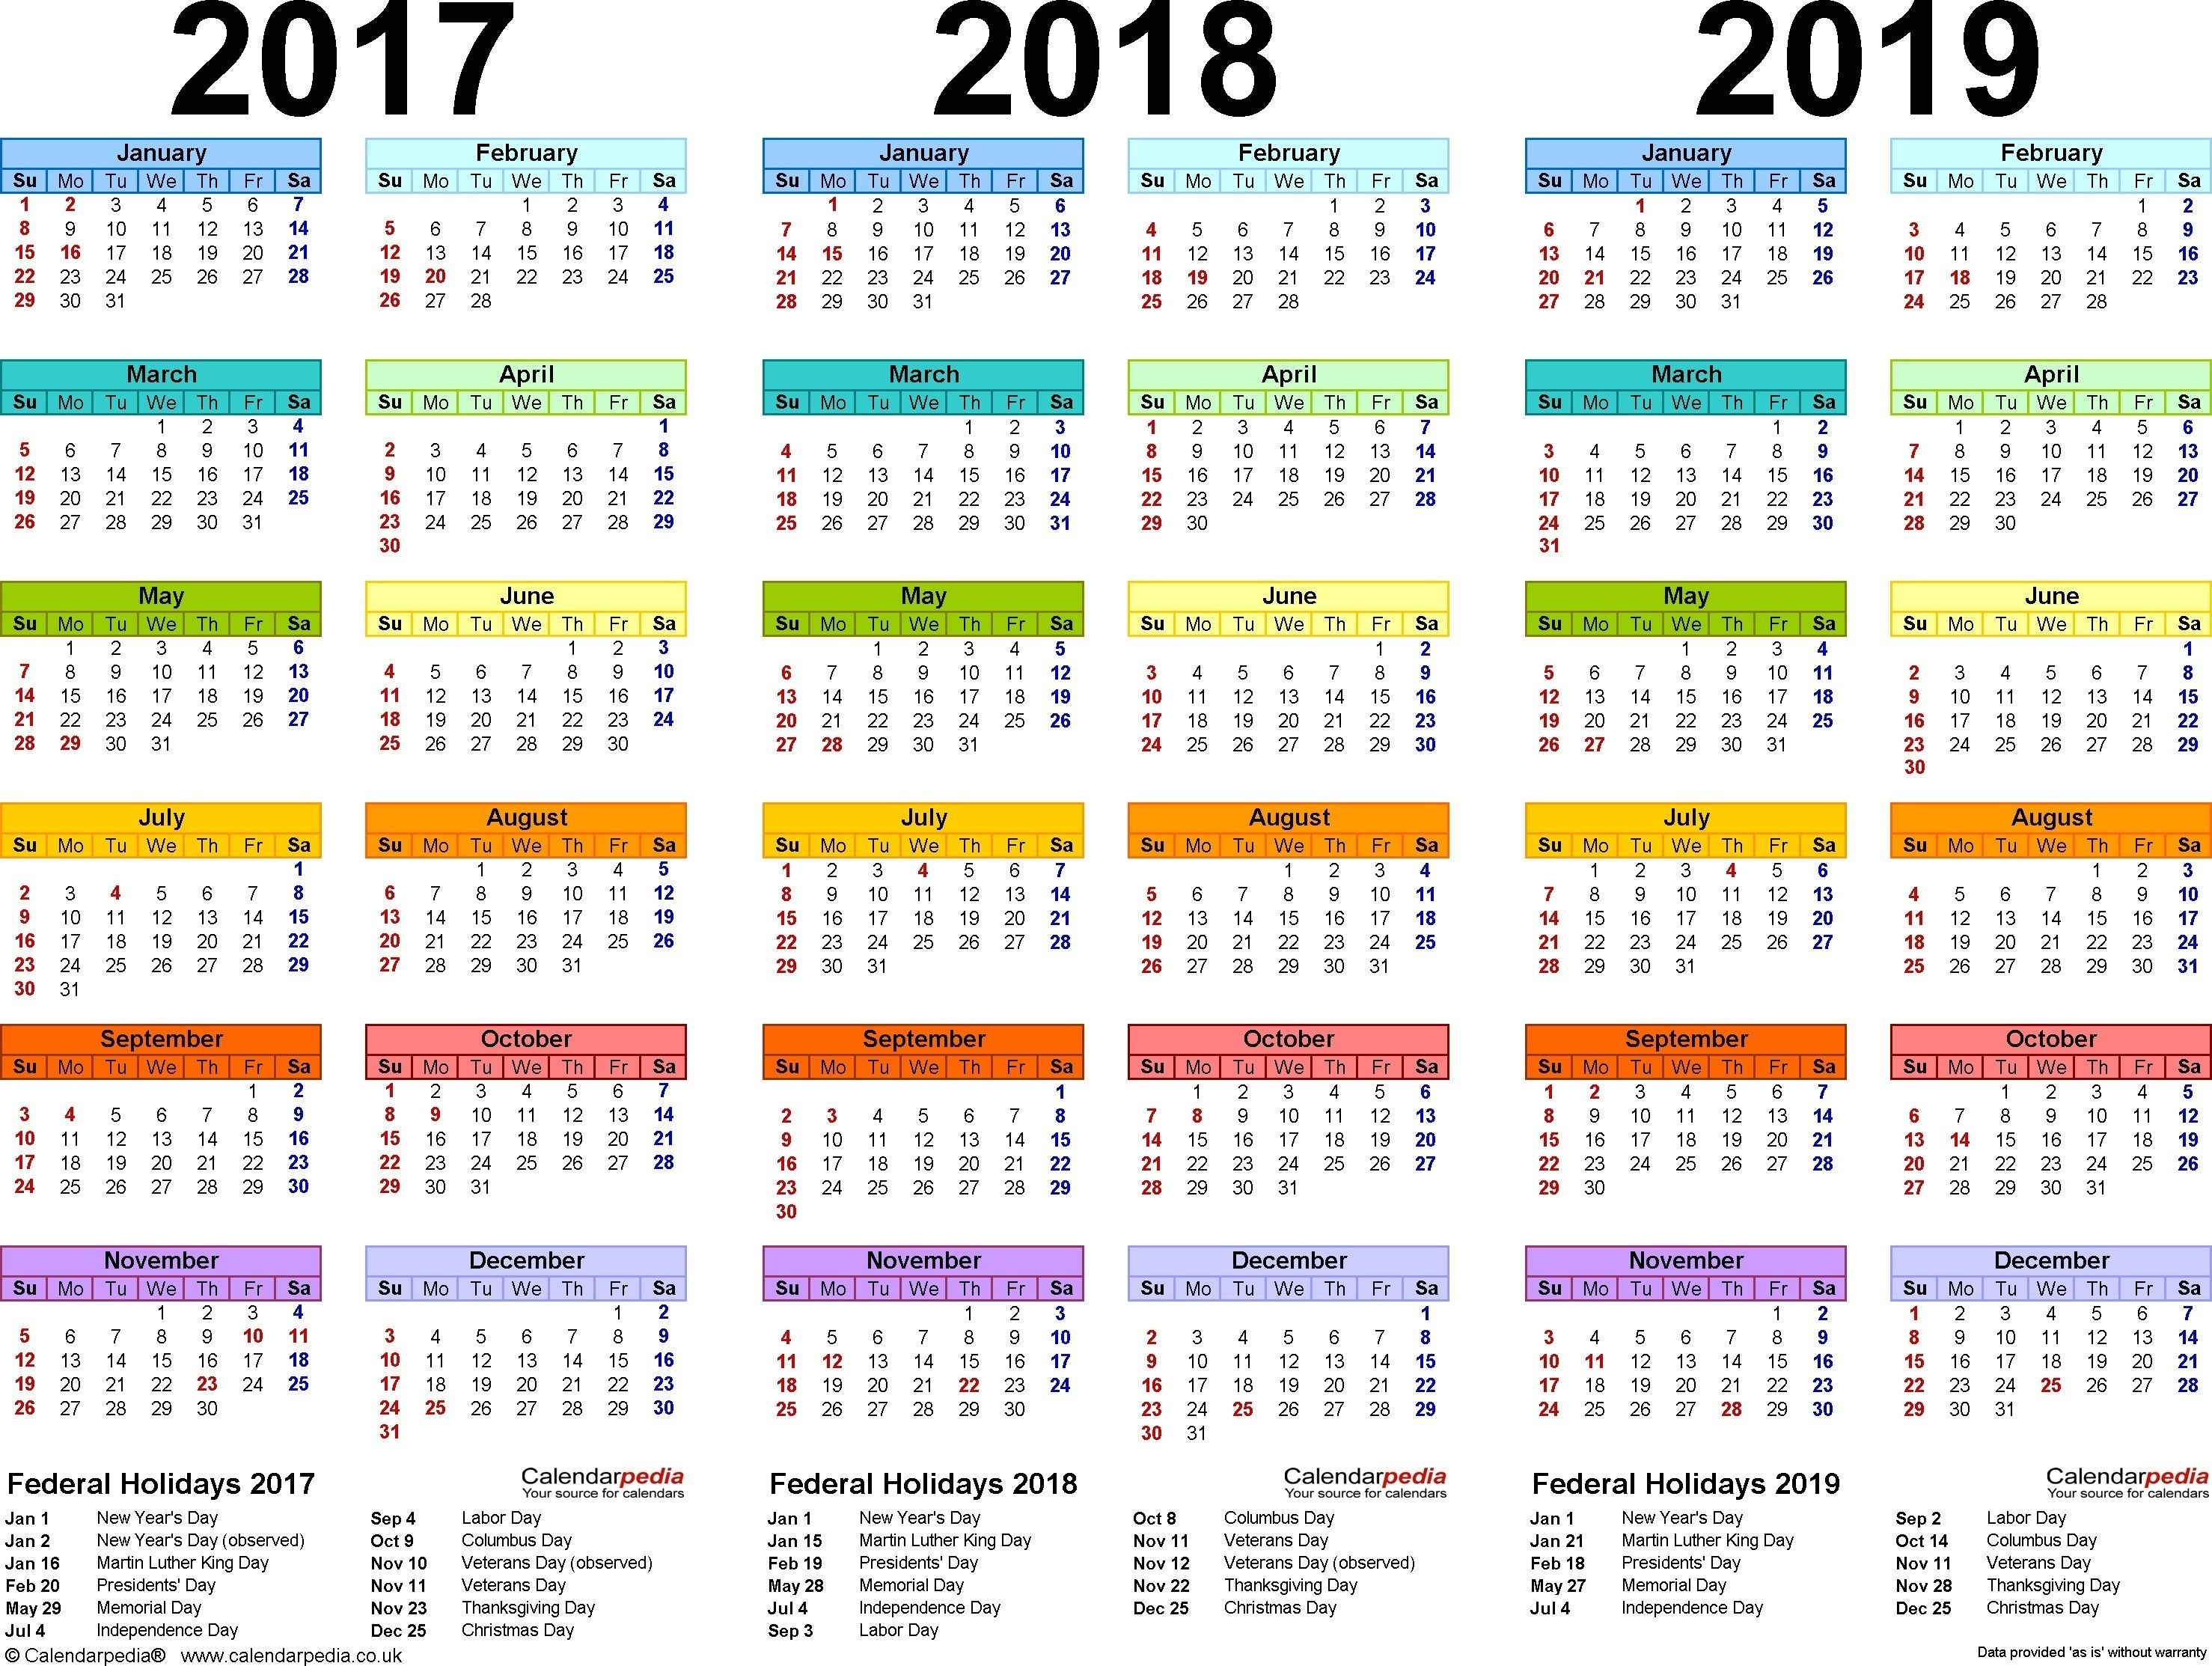 Depo Provera Printable Calendar 2019 August | Calendar